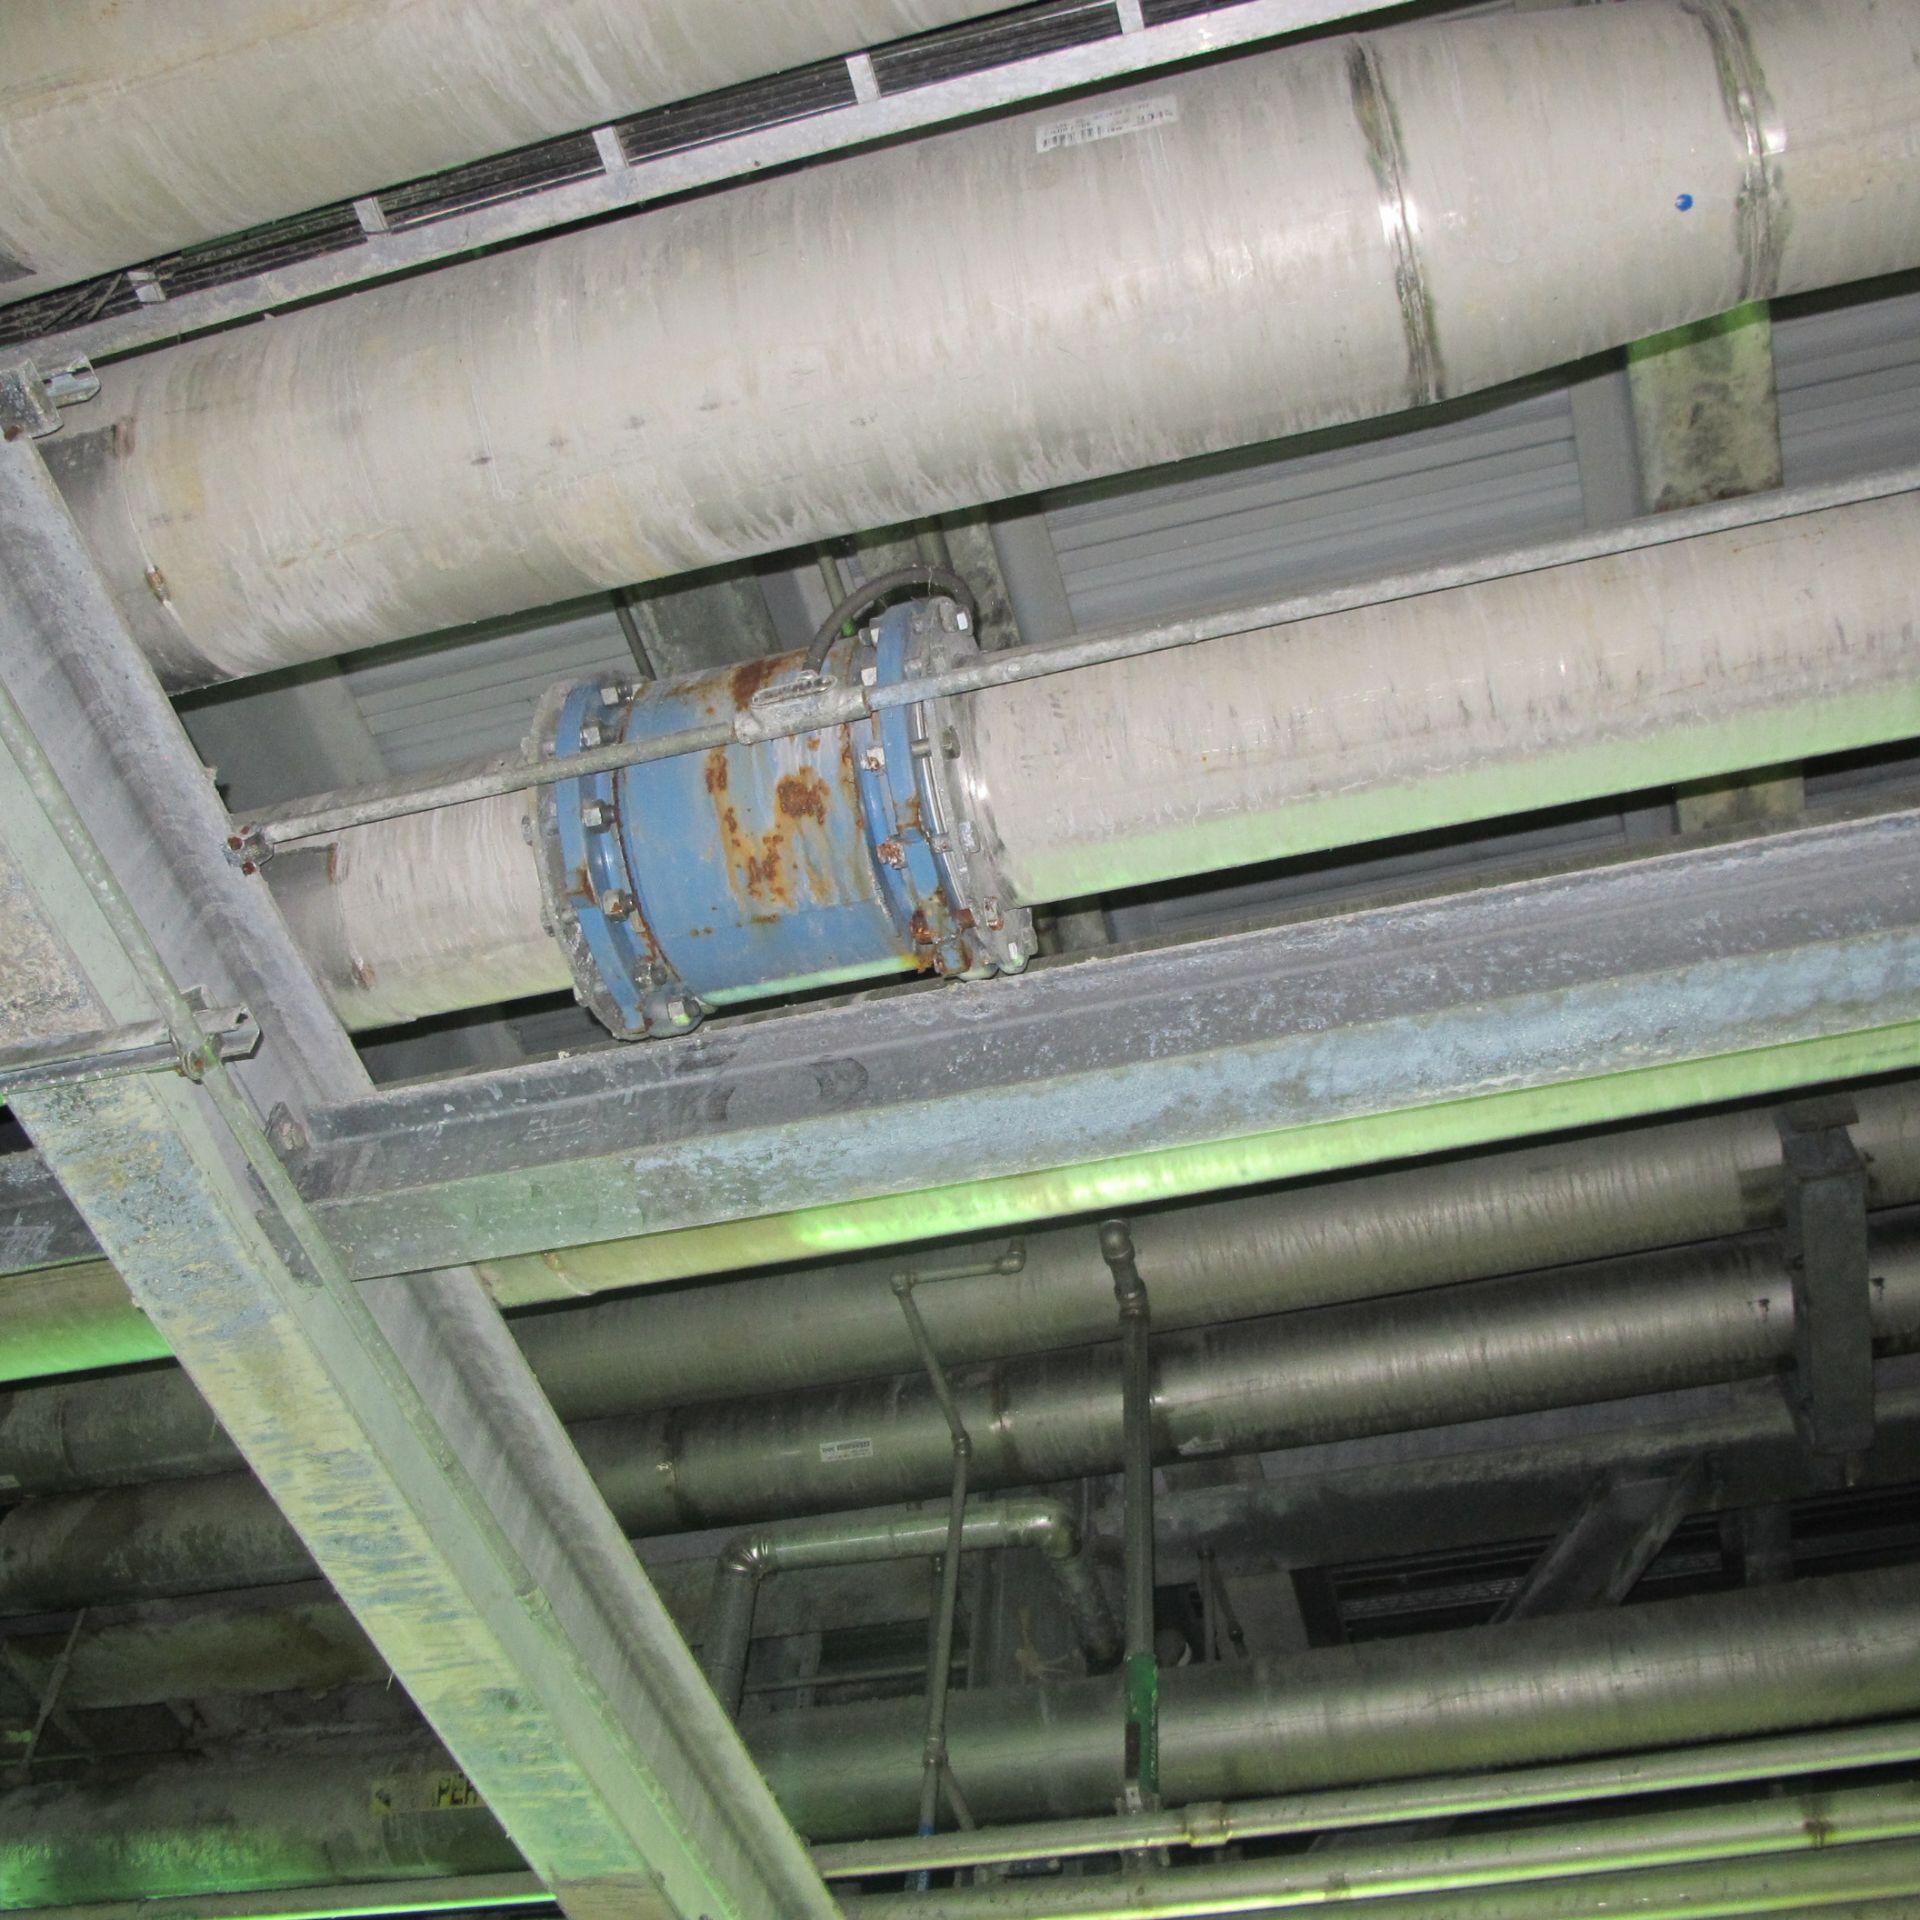 "Lot 271J - ROSEMOUNT MAGMETER 12"" (1ST FLOOR DEINKING BUILDING) W/ CONTROL PANEL"